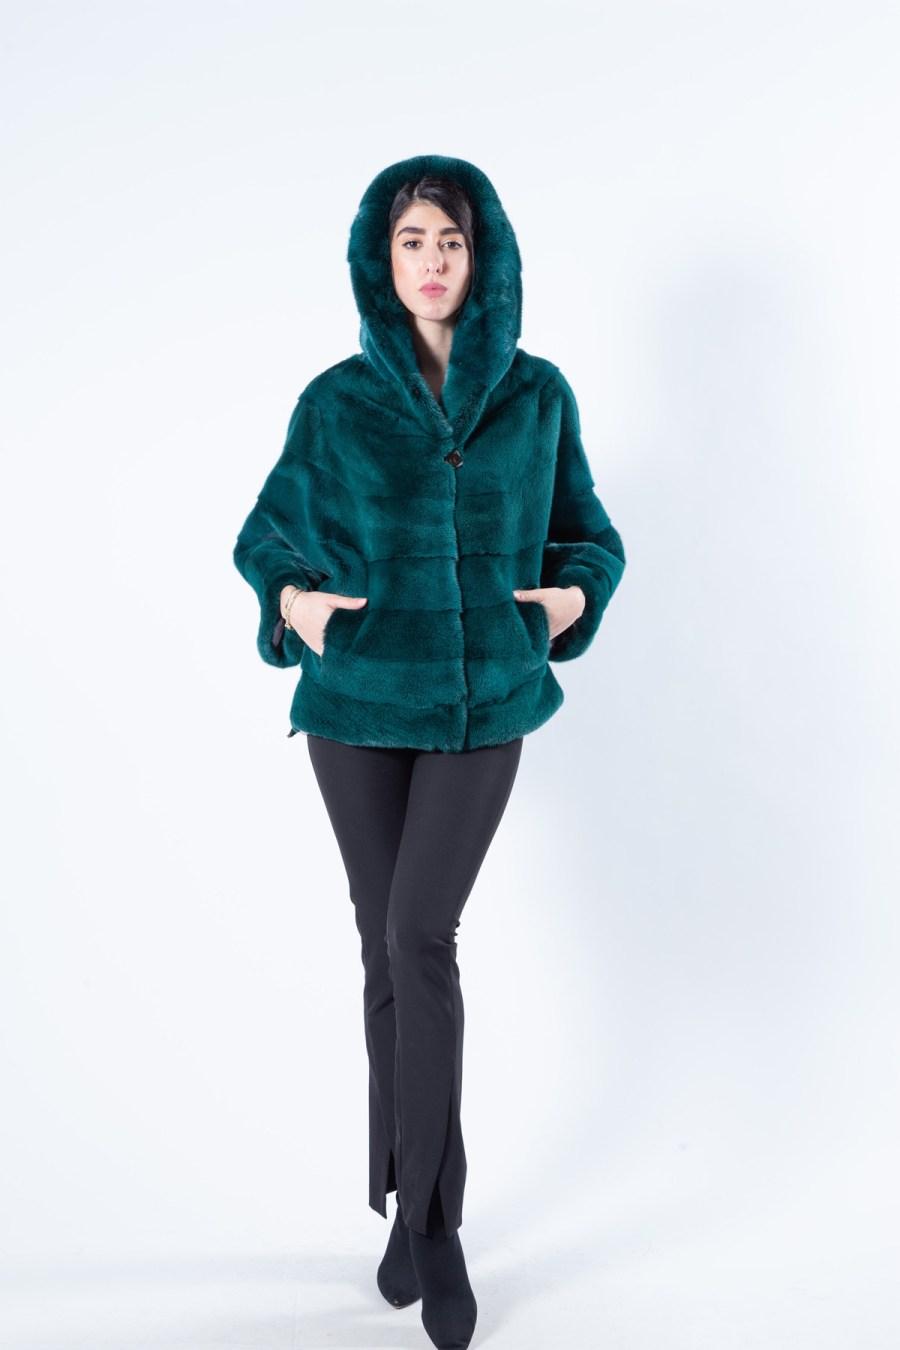 Shock Green Mink Fur Cape with Hood | Кейп из меха норки цвета Shock Green с капюшоном - Sarigianni Furs